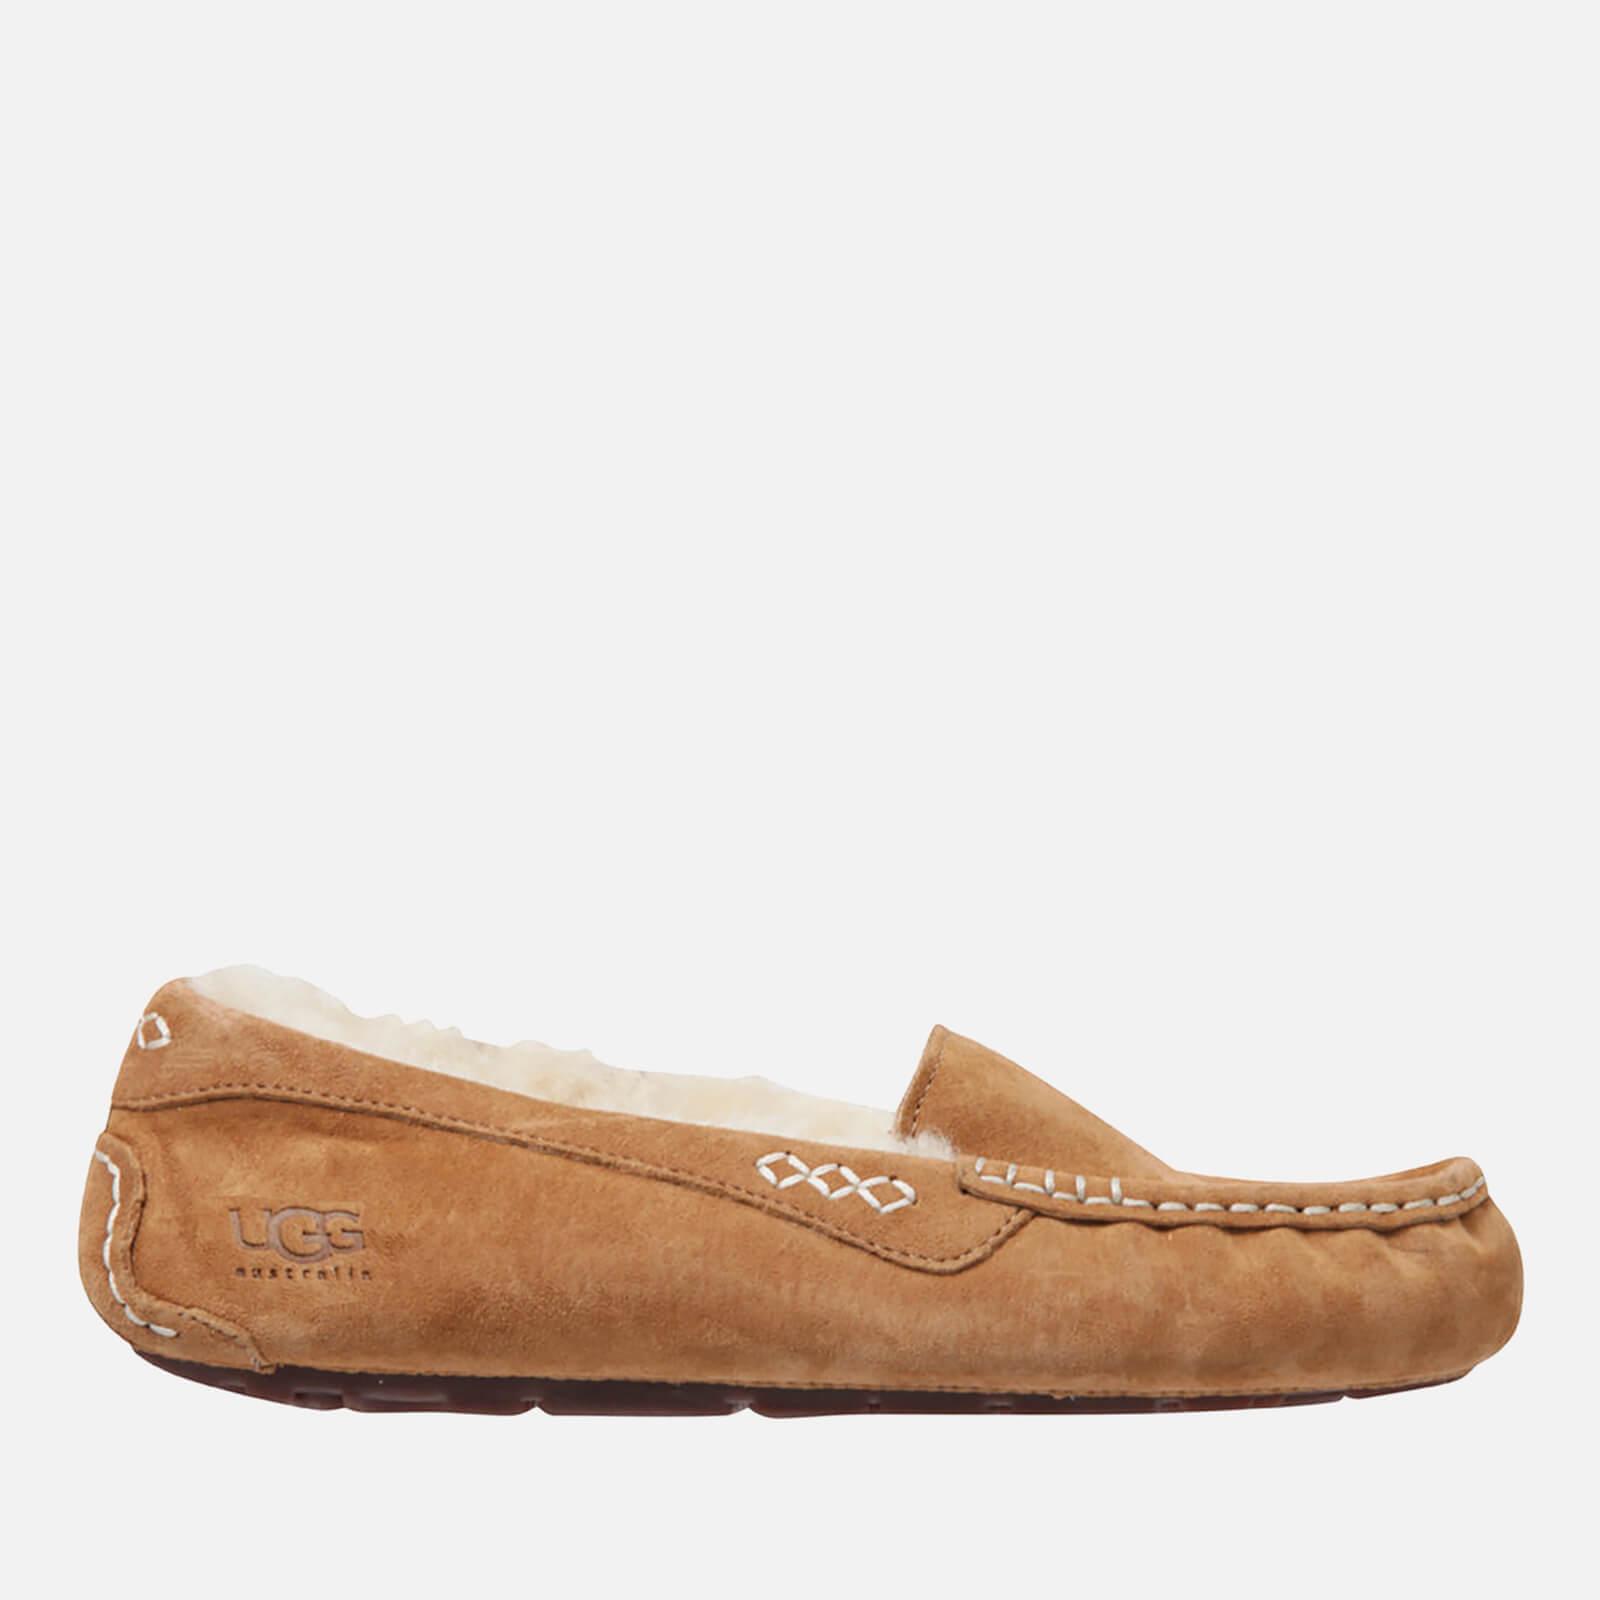 UGG Women's Ansley Moccasin Suede Slippers - Chestnut - UK 6